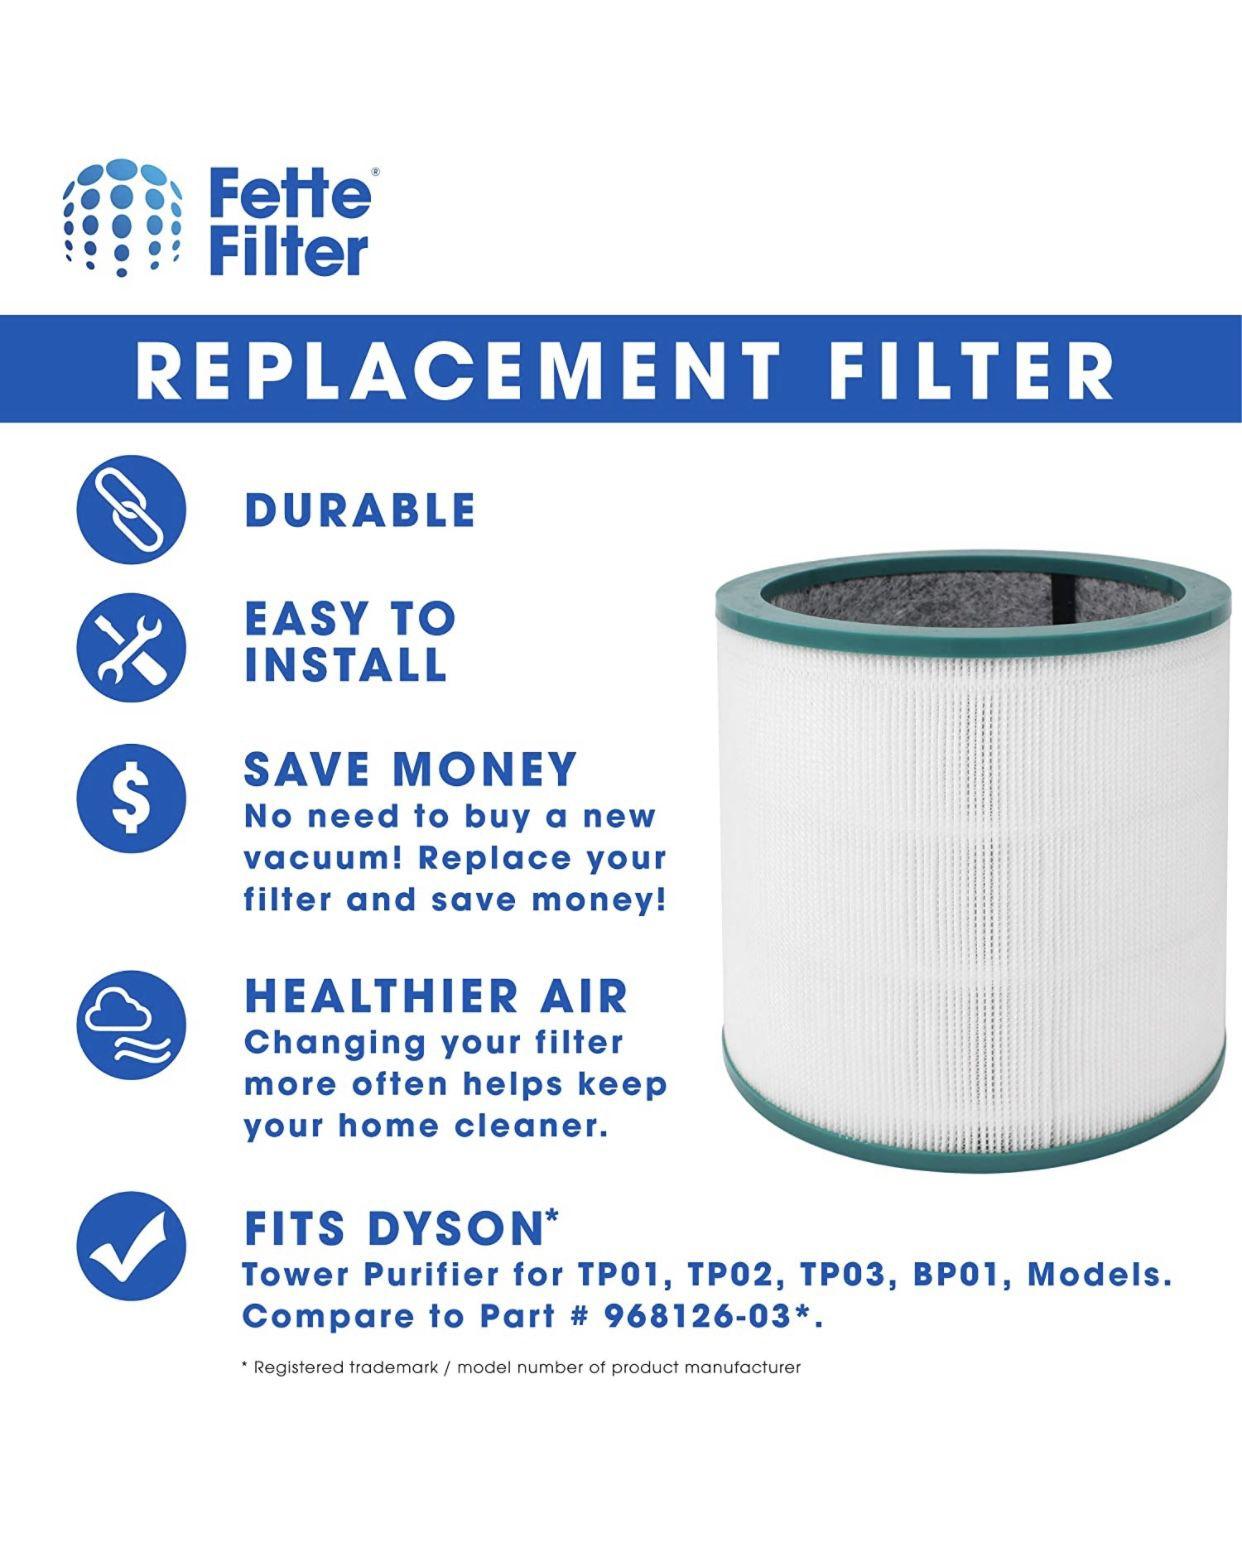 ars  990 R Fette Filter - 2 Pack of Air Purifier True HEPA Premium Grade Filters